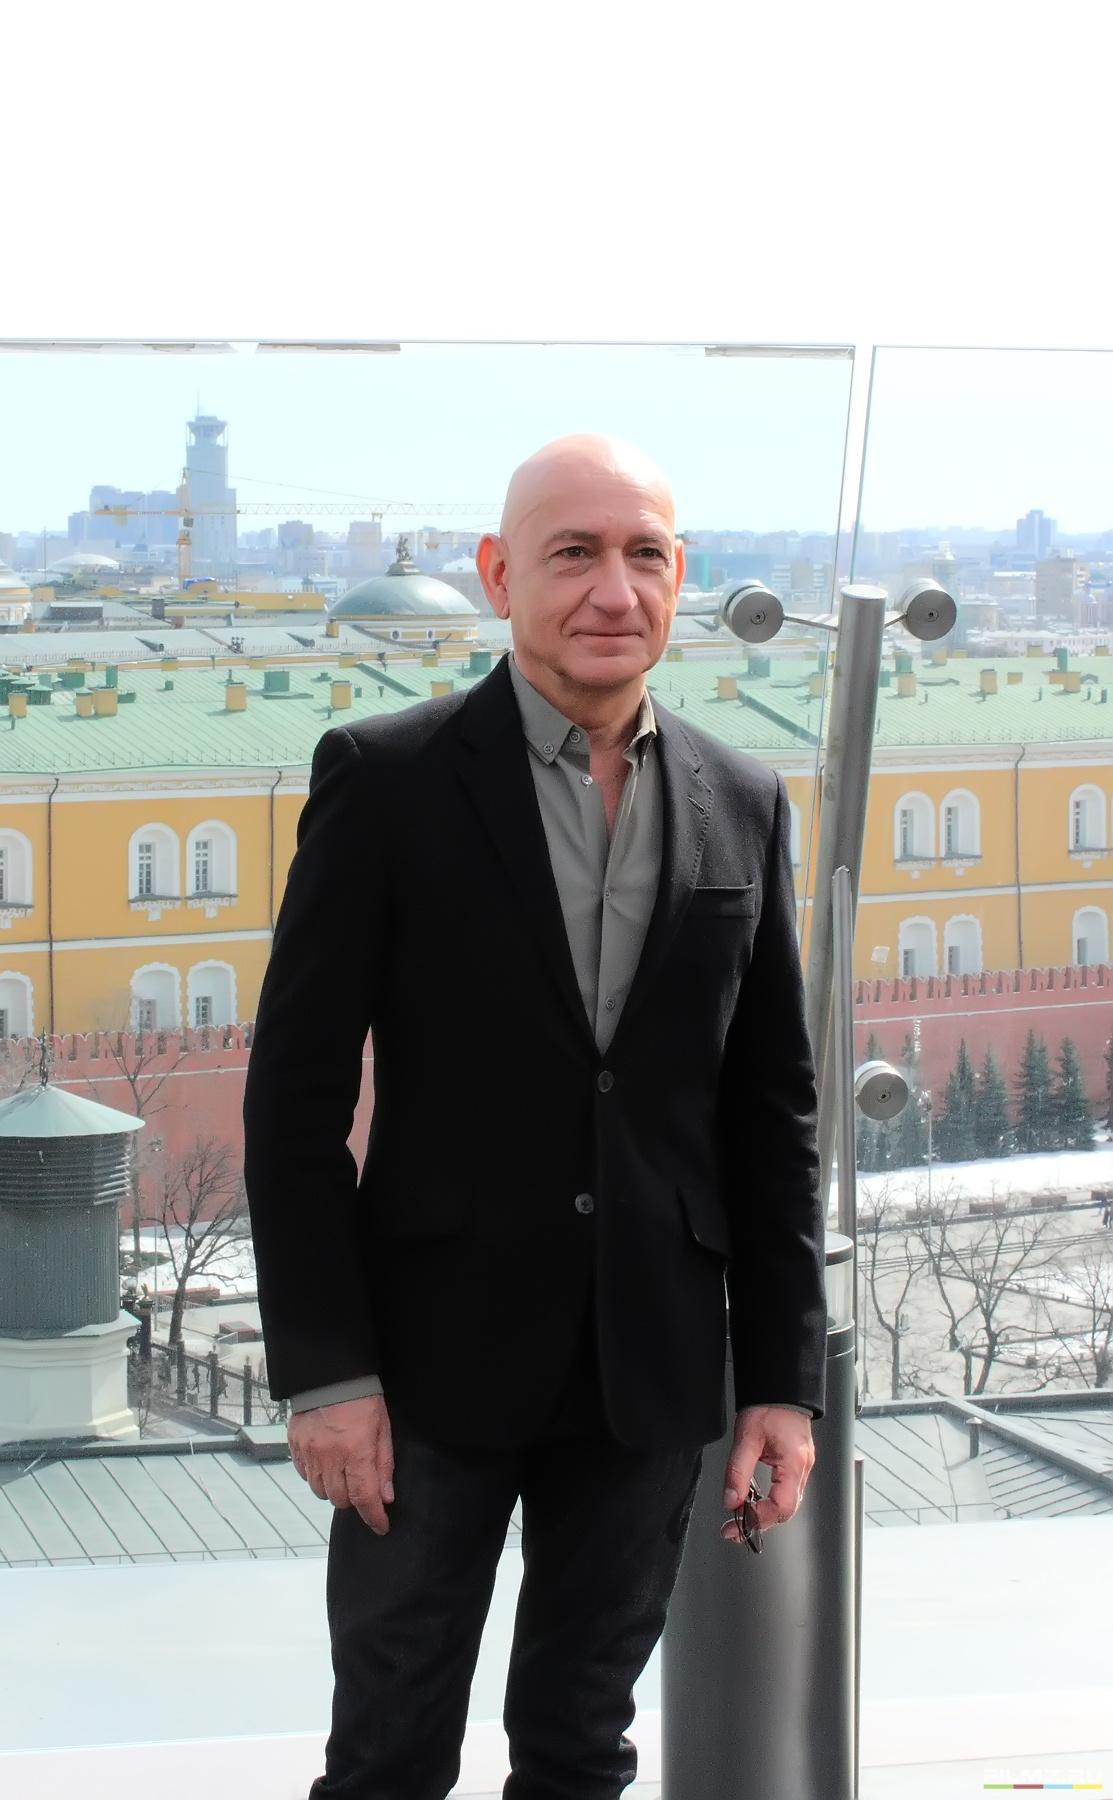 фотосессия Роберт Дауни-мл. и Бен Кингсли в Москве Бен Кингсли,